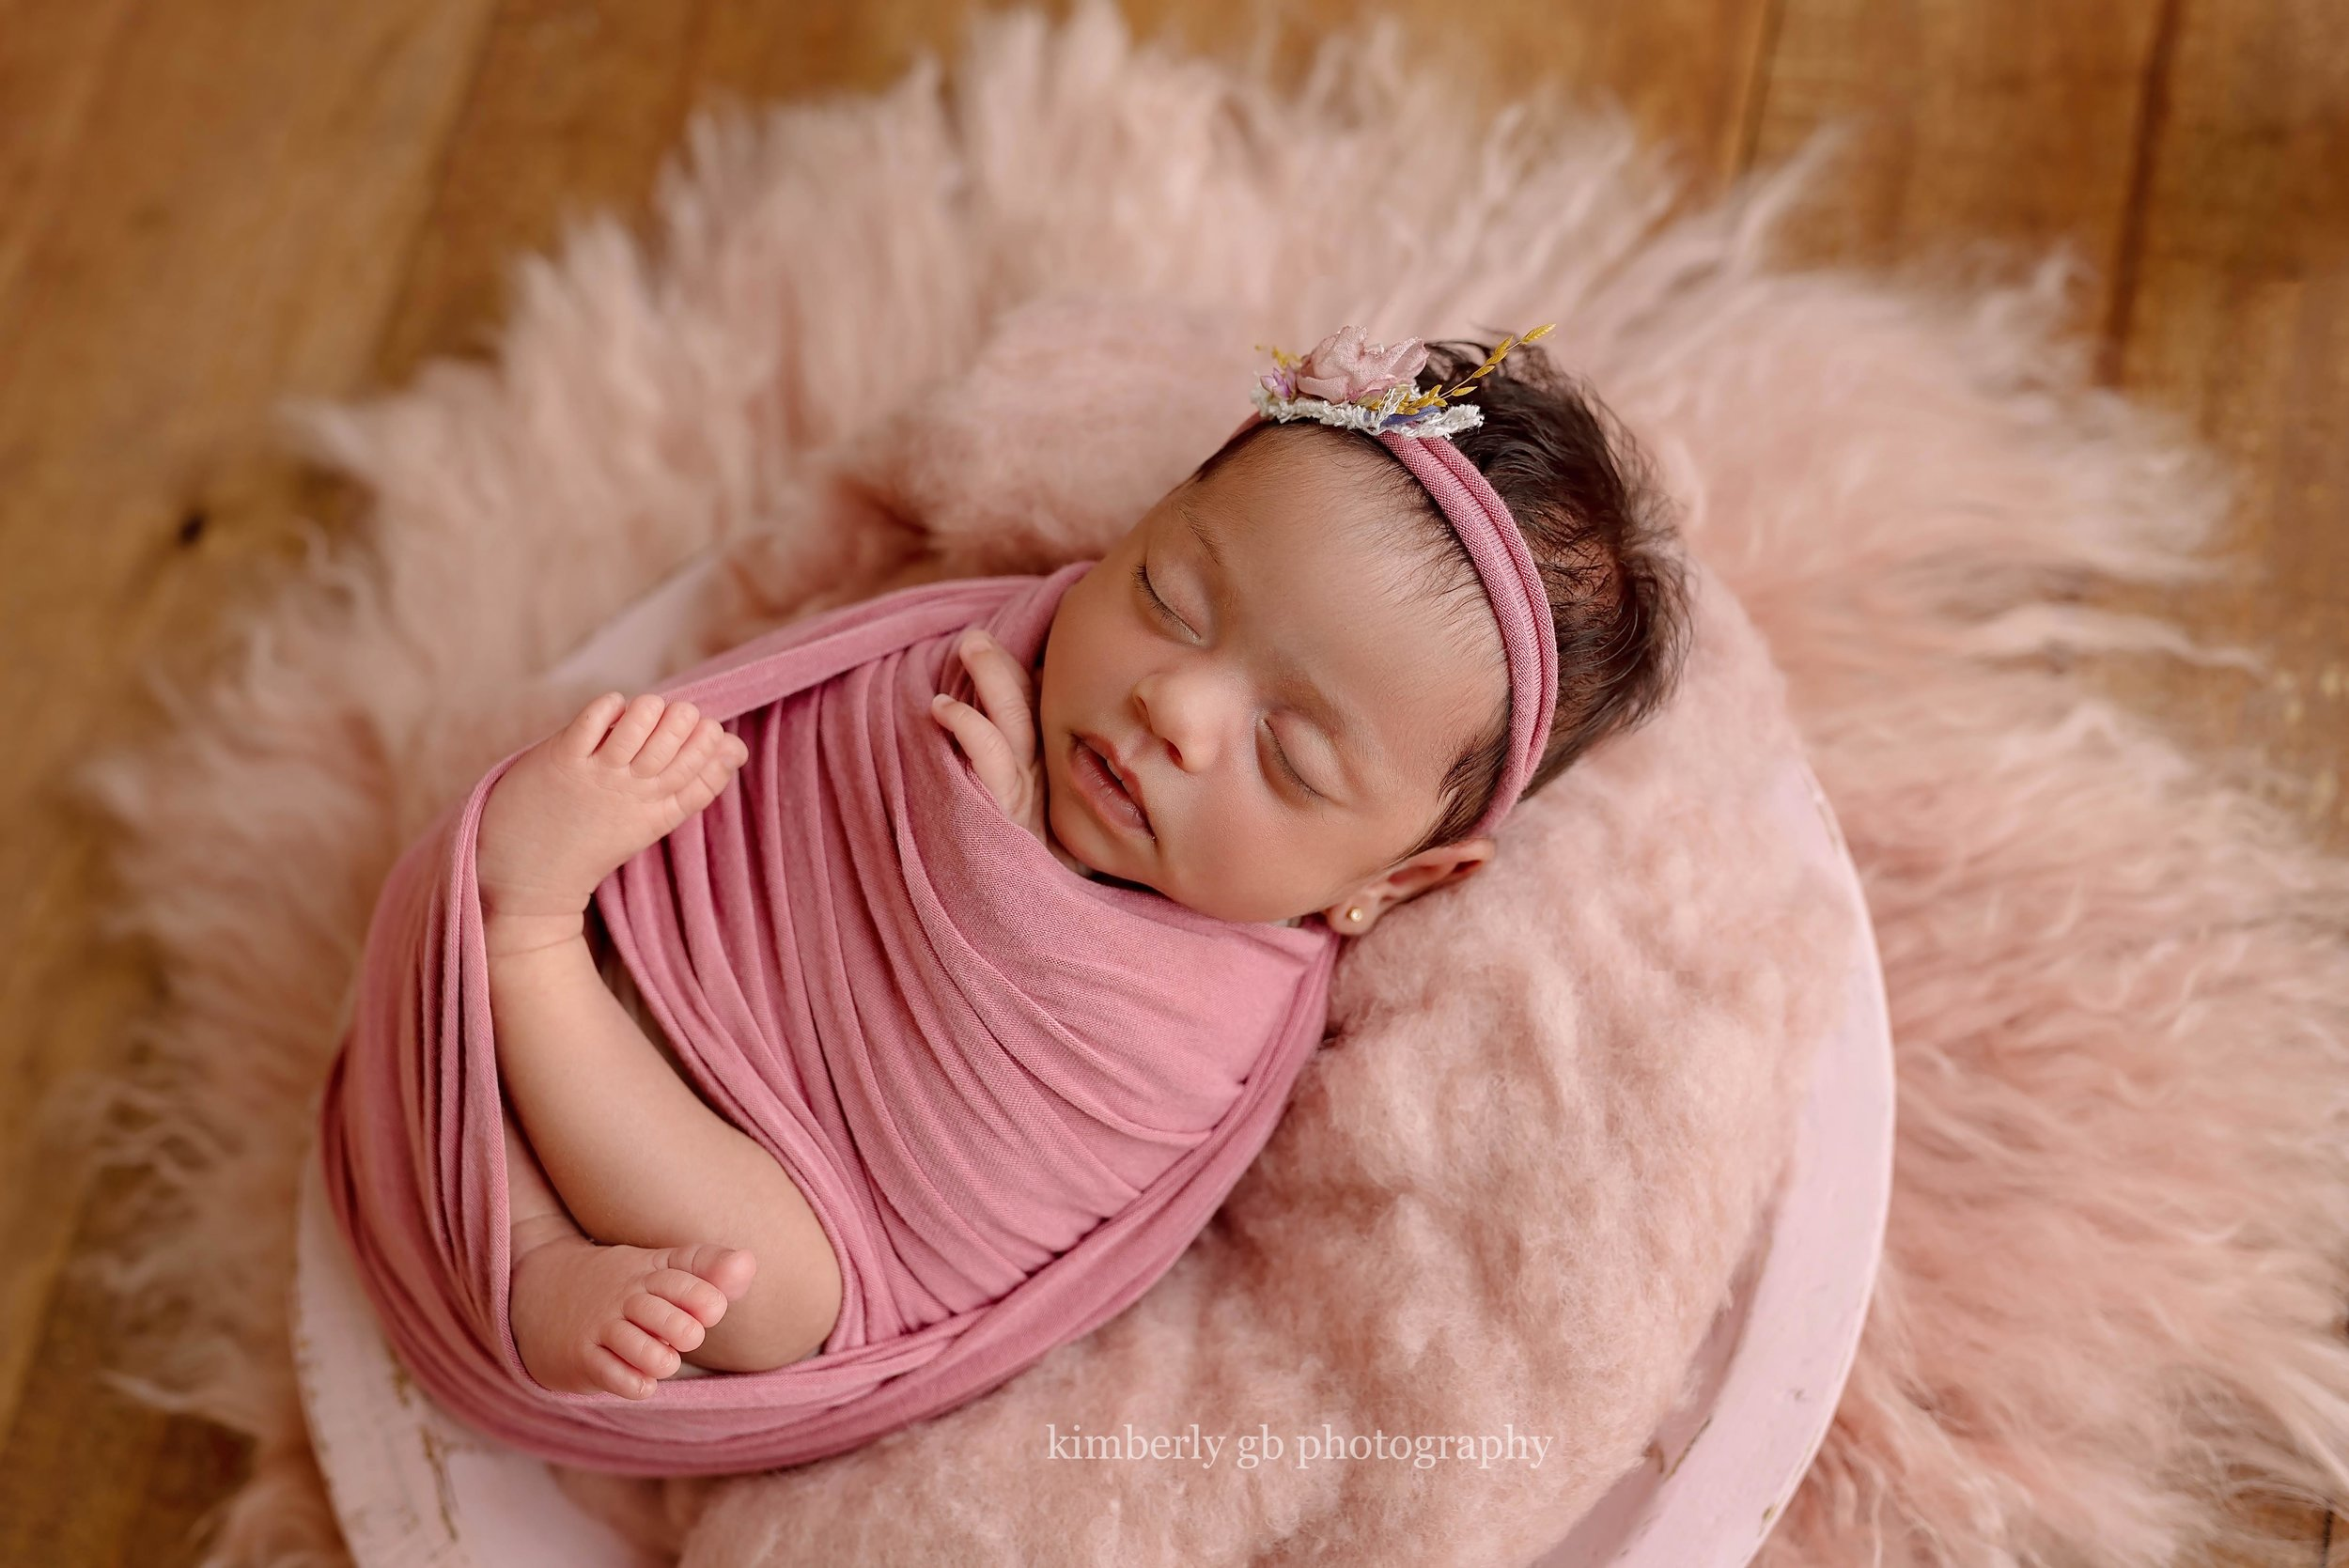 fotografia-de-recien-nacidos-bebes-newborn-en-puerto-rico-kimberly-gb-photography-fotografa-348.jpg